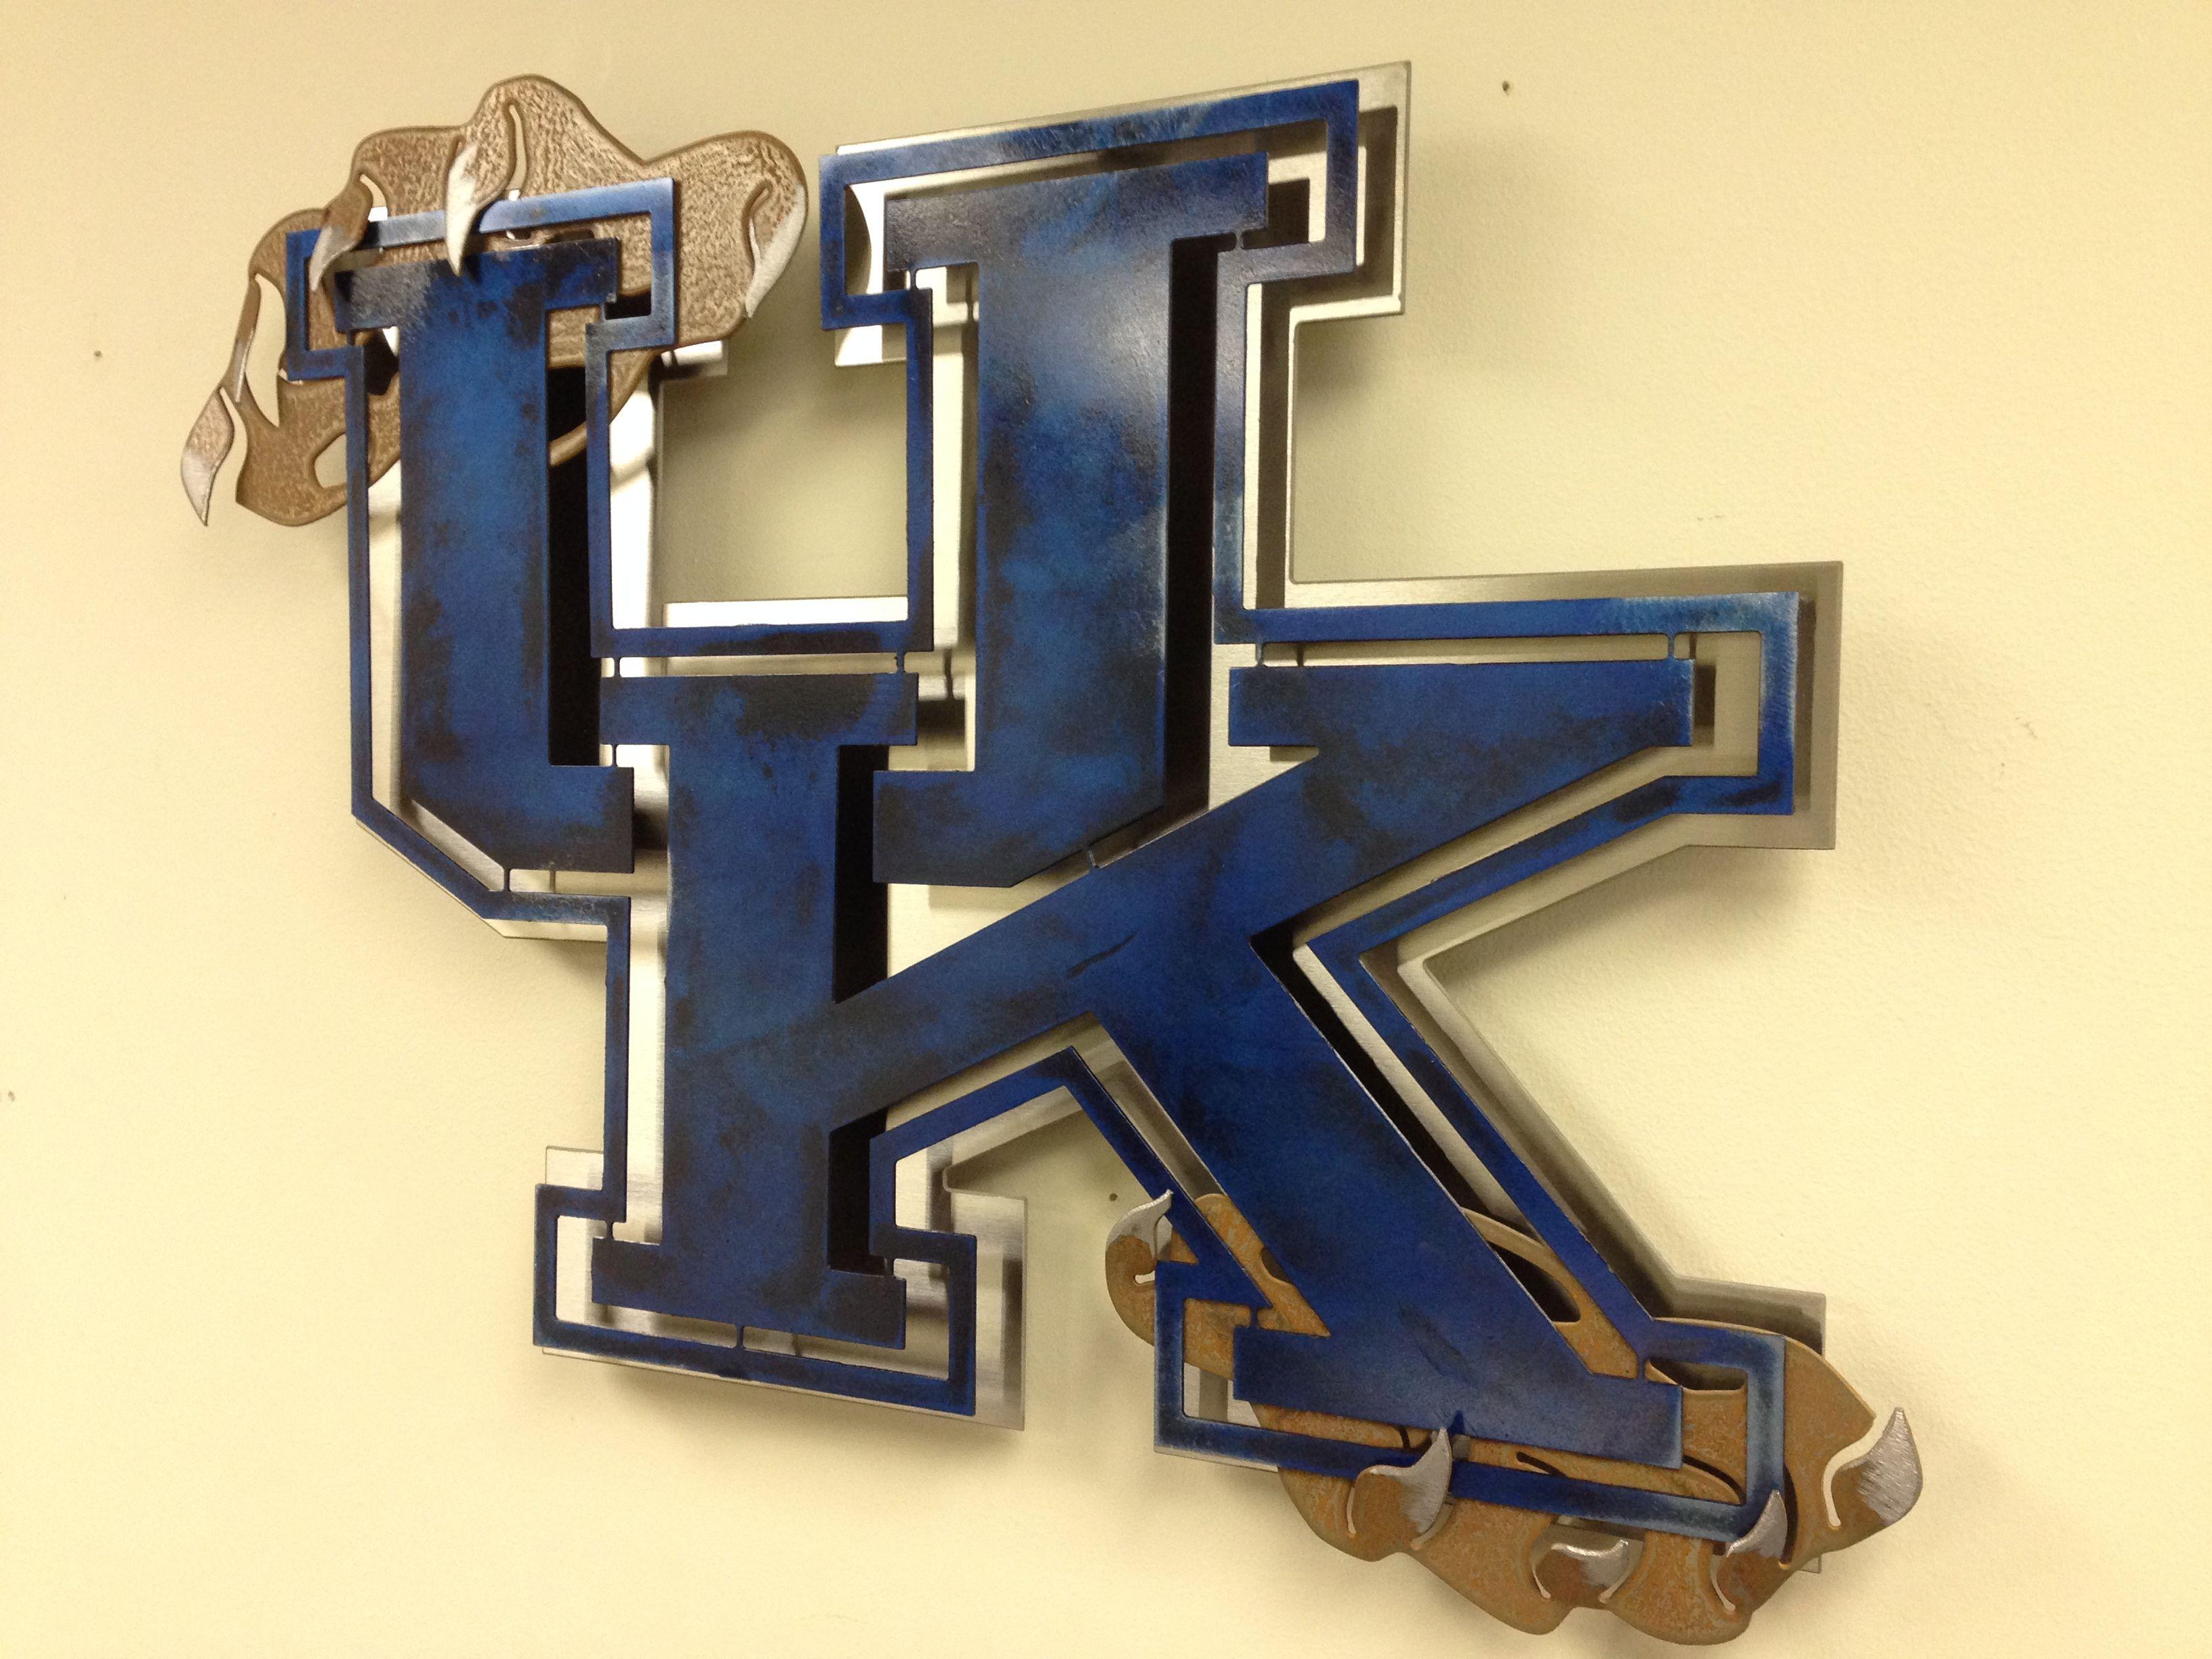 University of Kentucky Stainless Steel Wall Art. Custom made metal ...